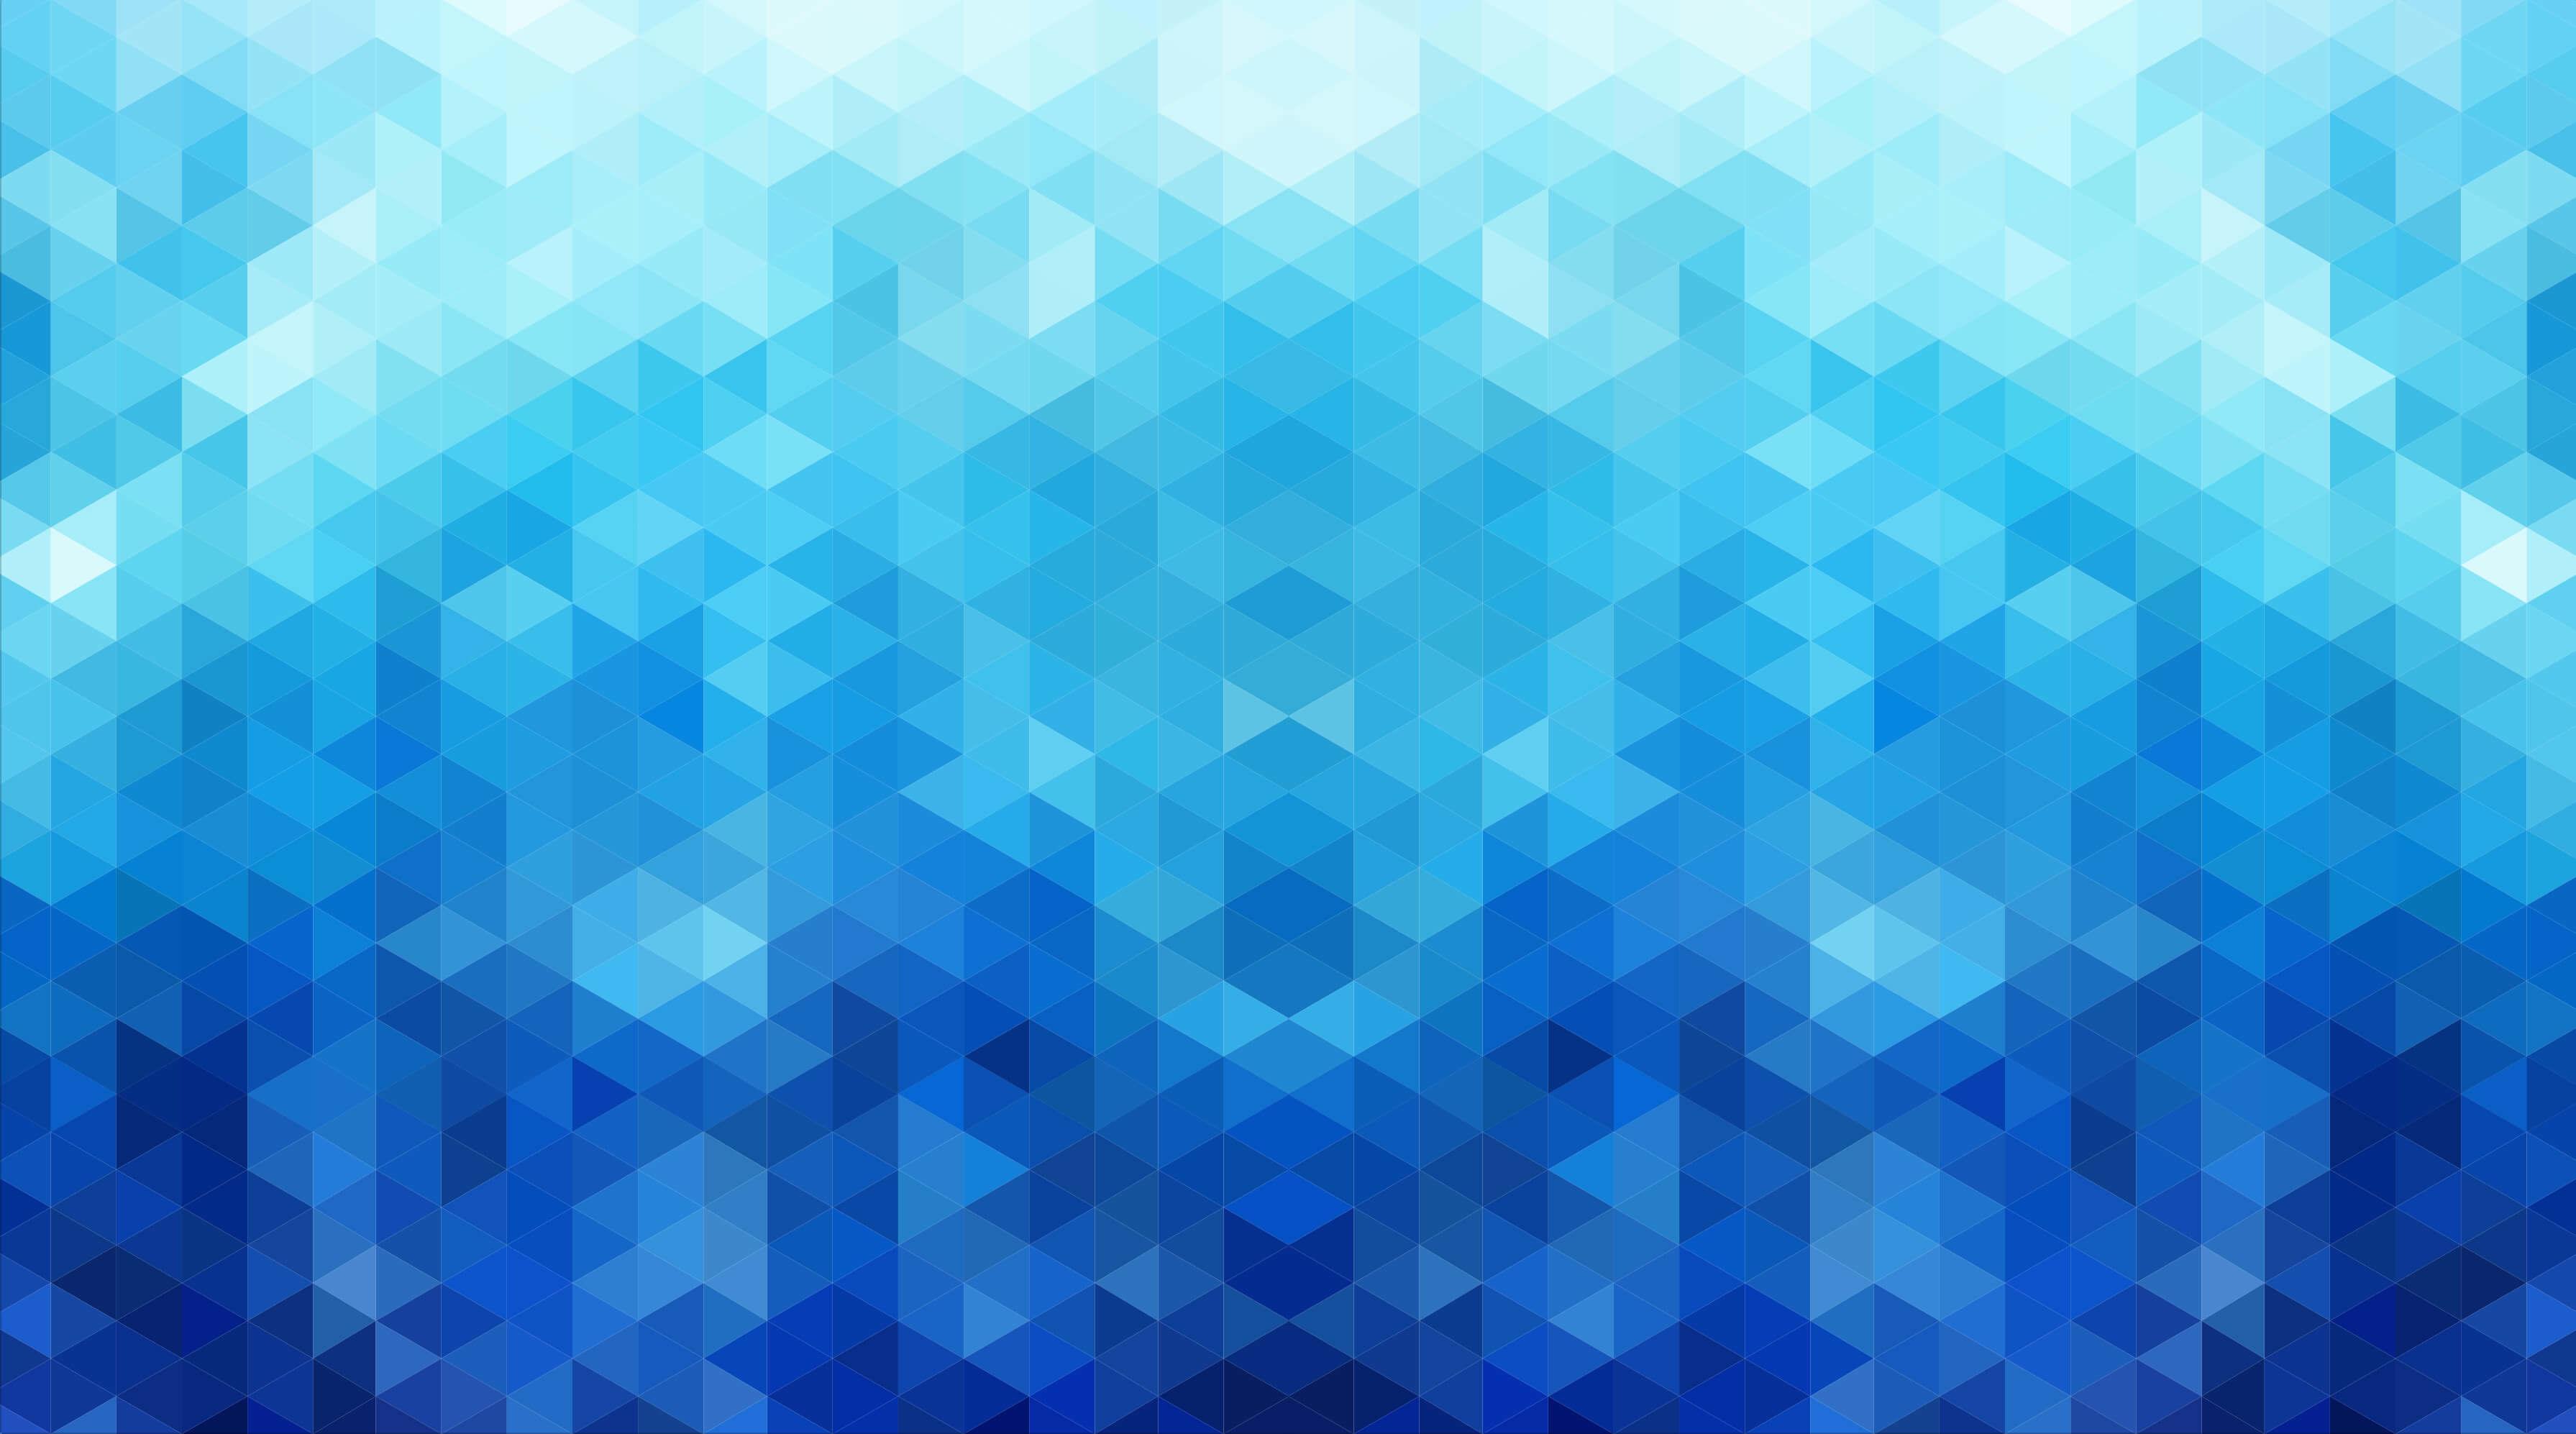 Geometric Blue Wallpapers - Wallpaper Cave